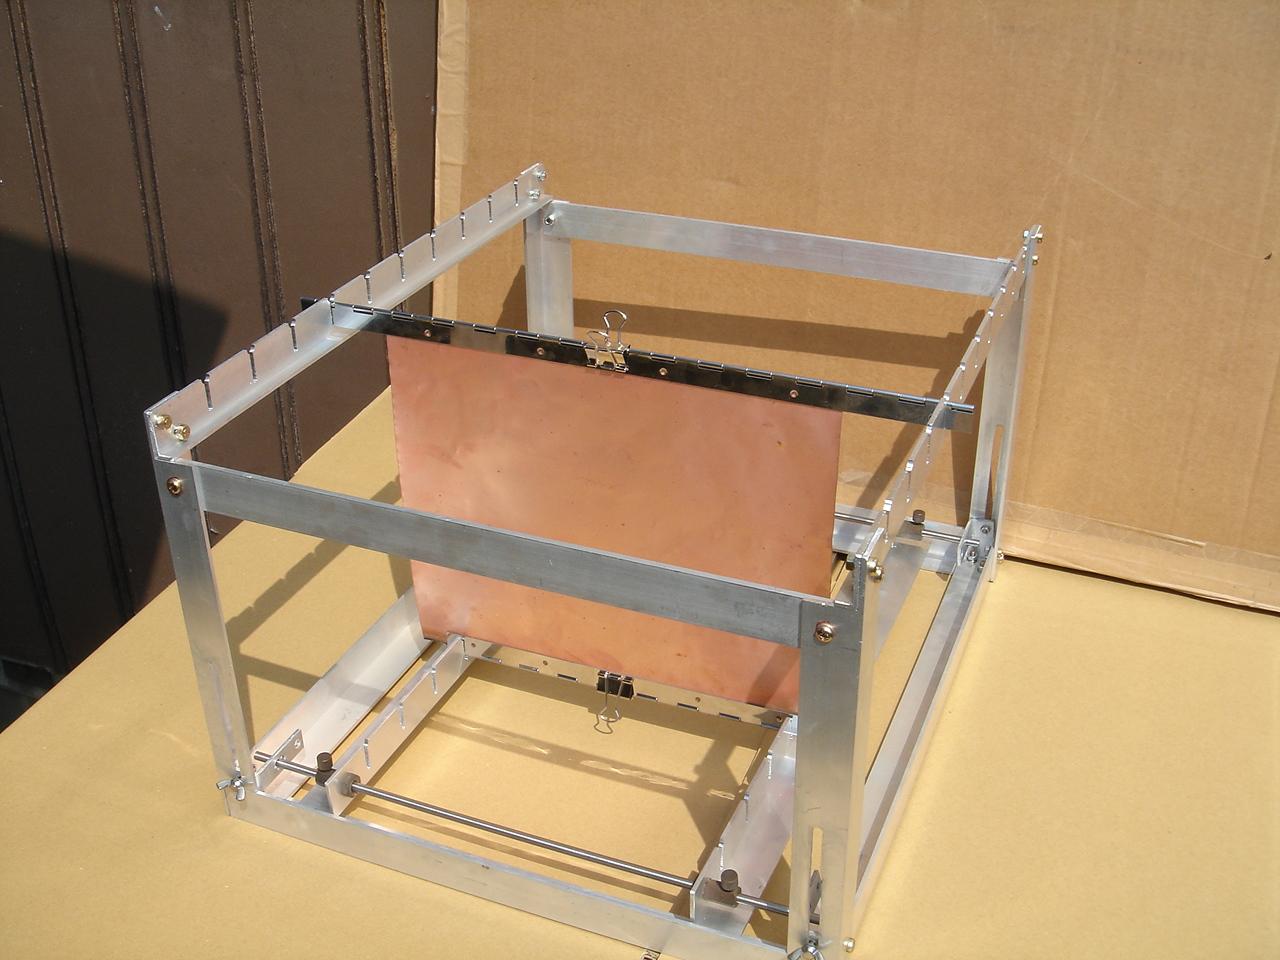 K-930 プリント基板 基板ラック ソルダーレジスト 誠和ケミカル株式会社